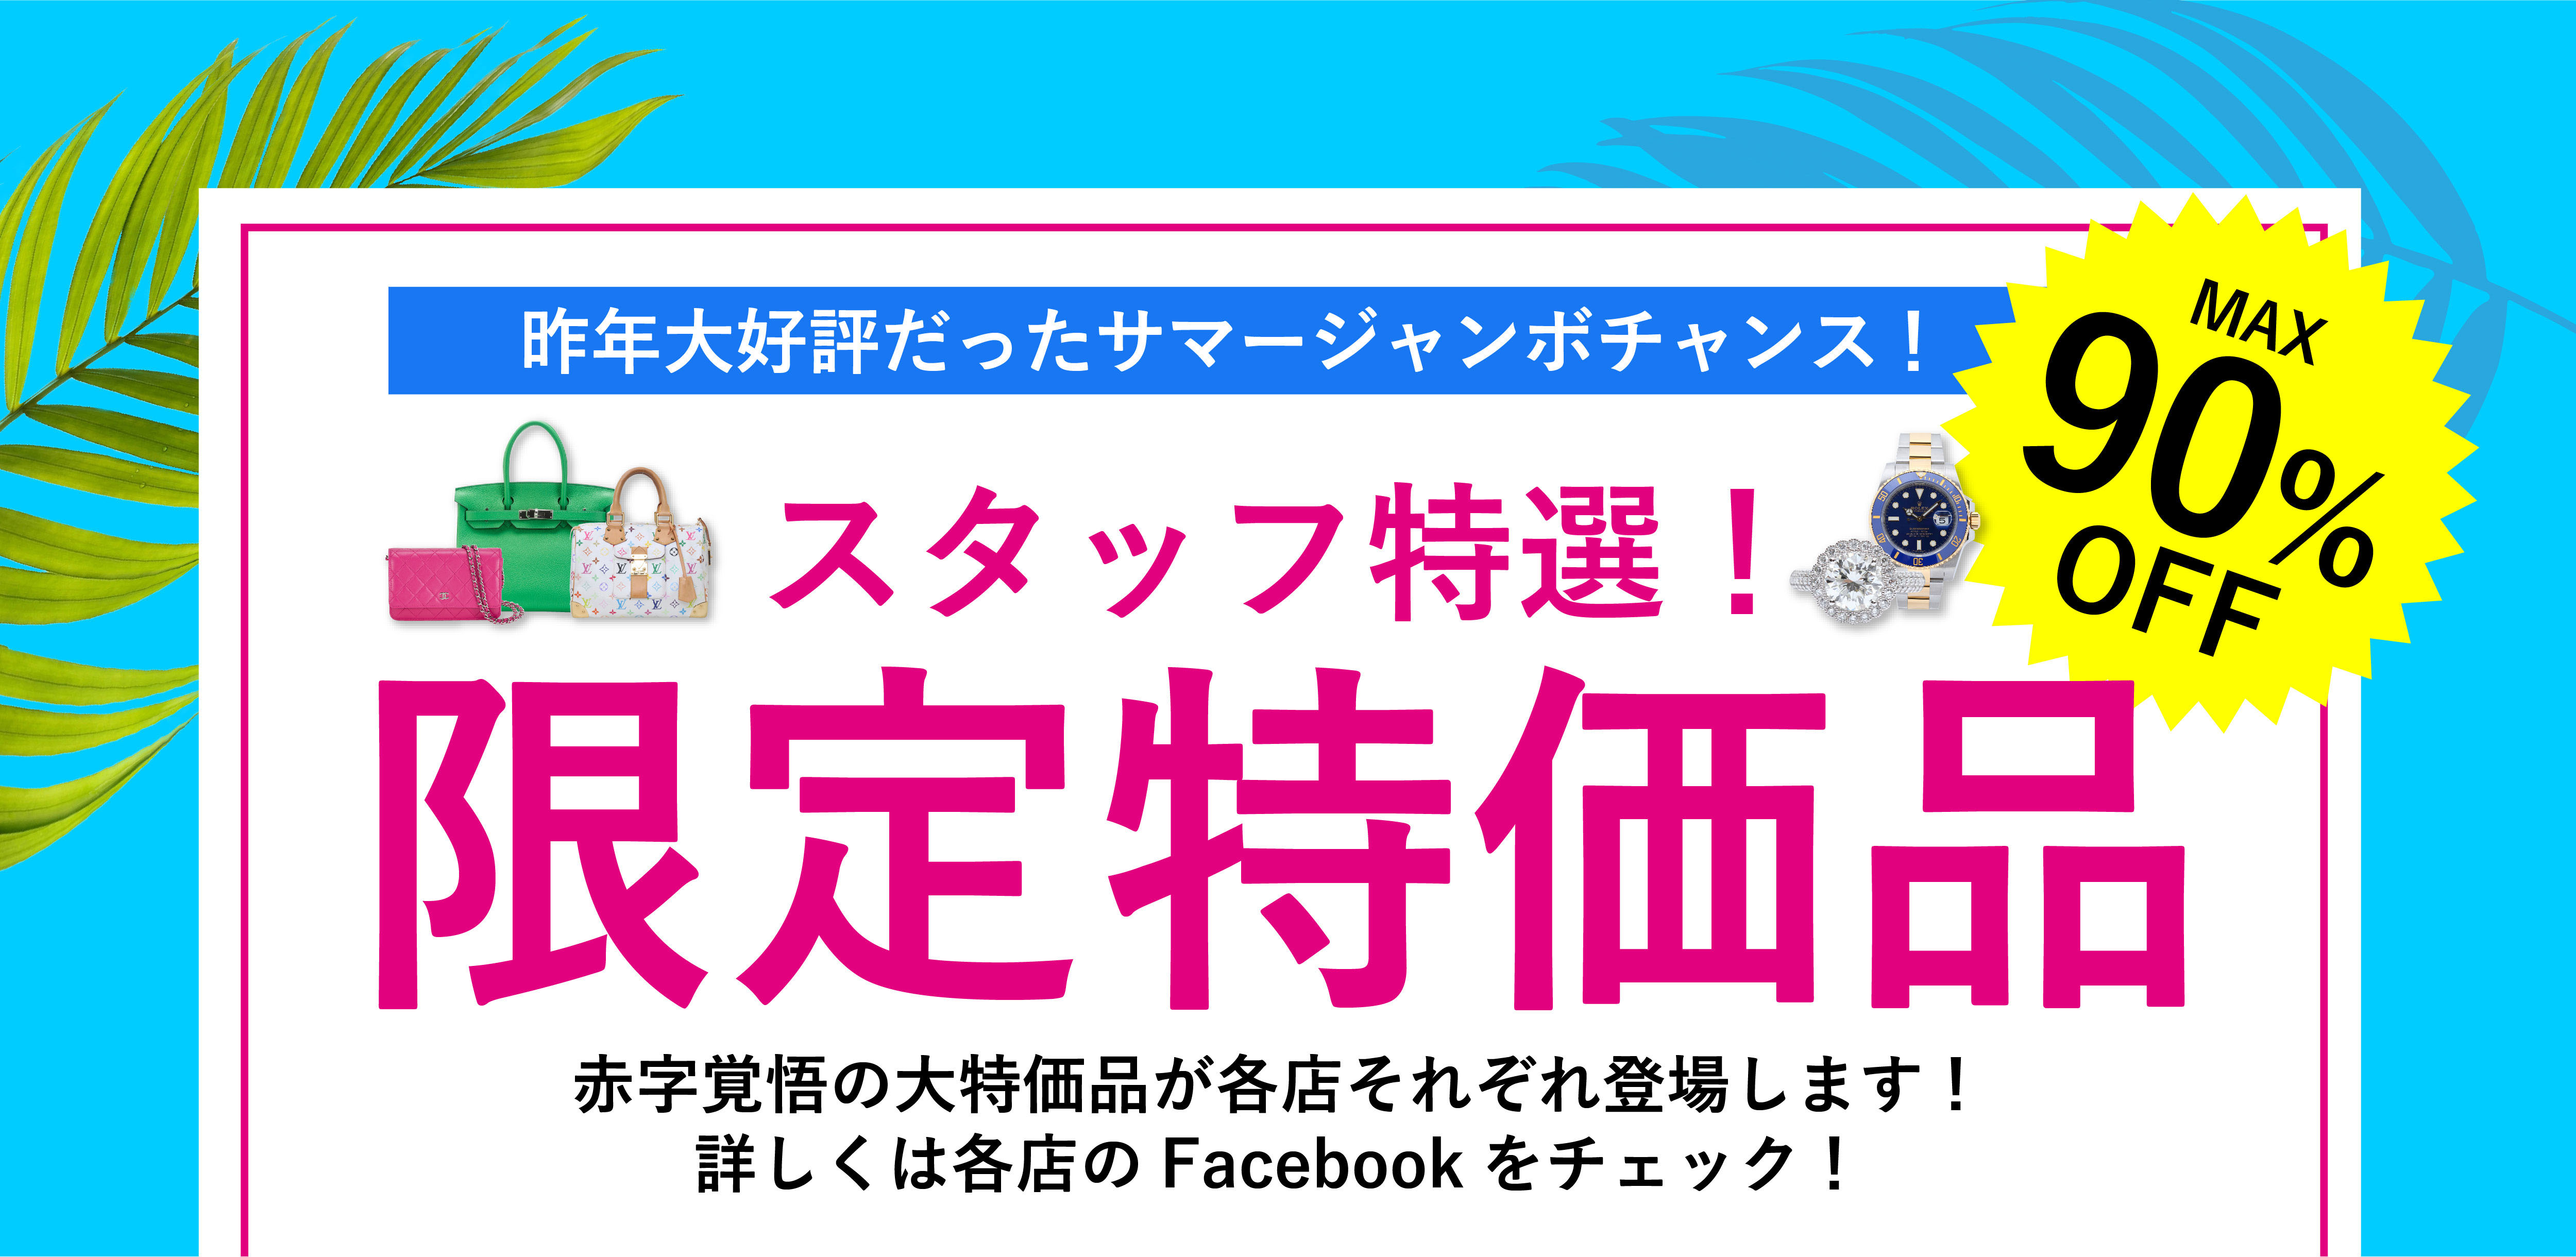 SUMMERSALE_JP_01